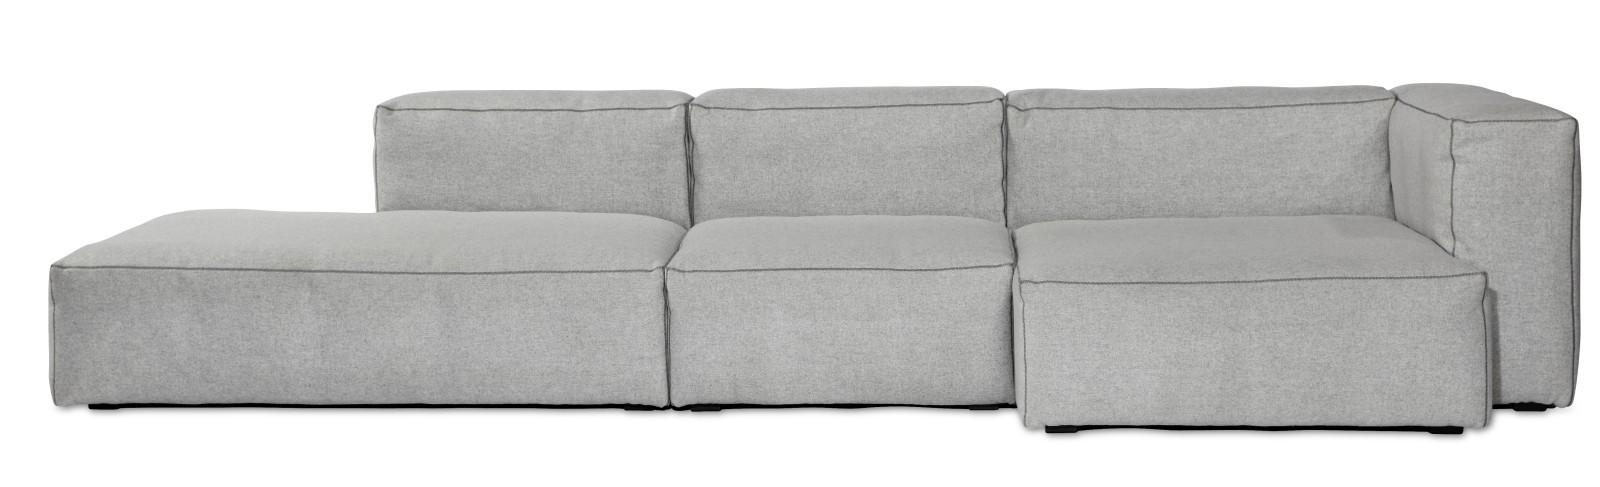 Mags Soft Chaise Lounge Short Modular Element S8262 - Left Hallingdal 65 100